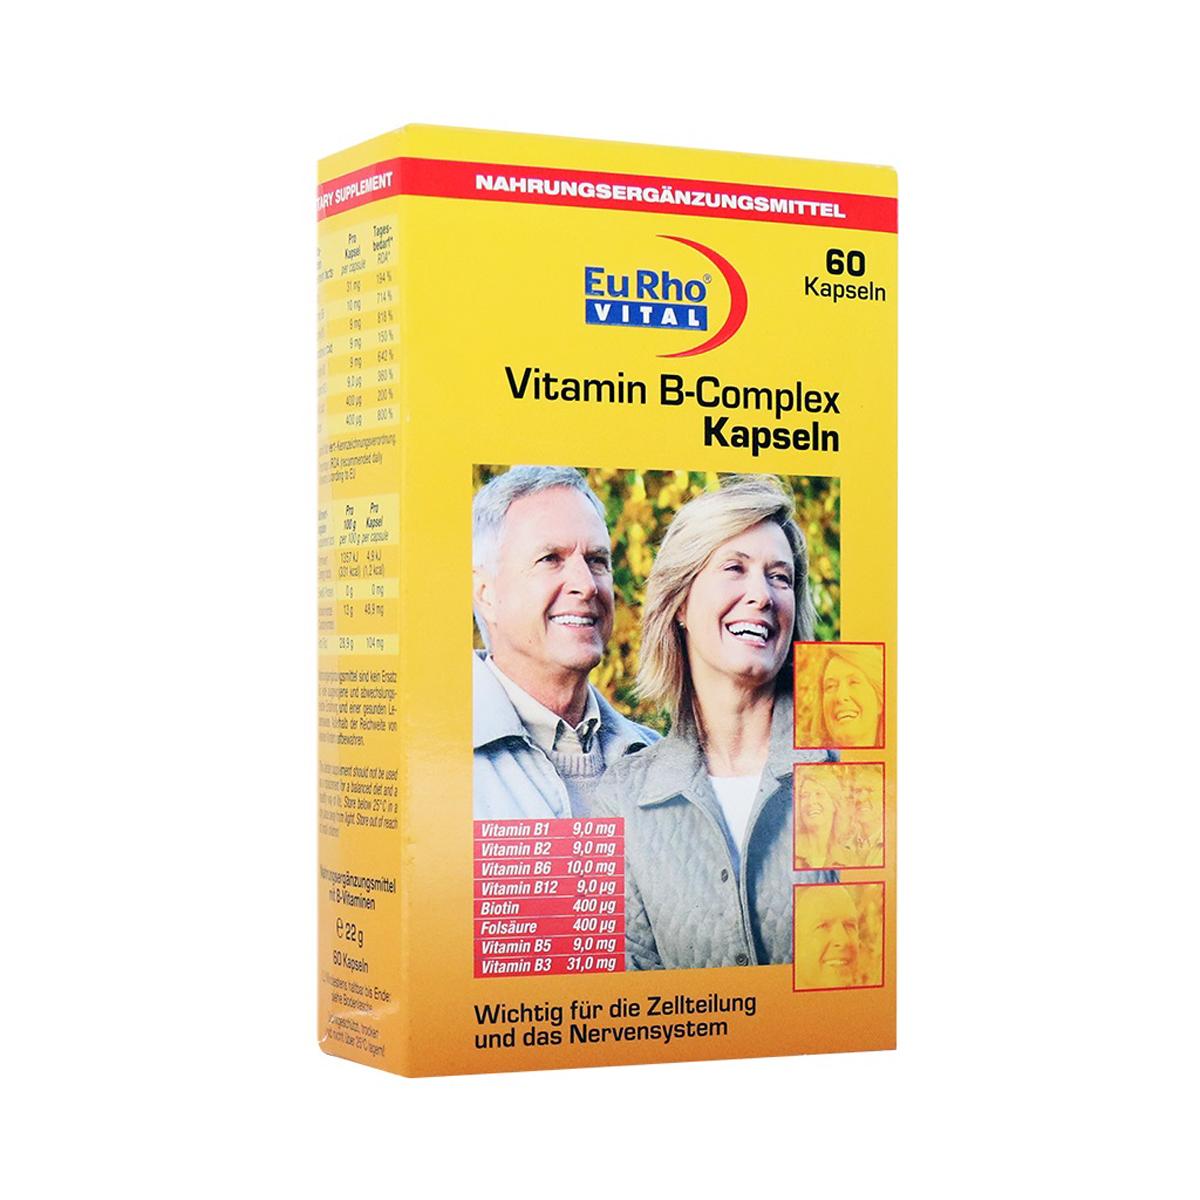 کپسول ویتامین ب کمپلکس یورو ویتال